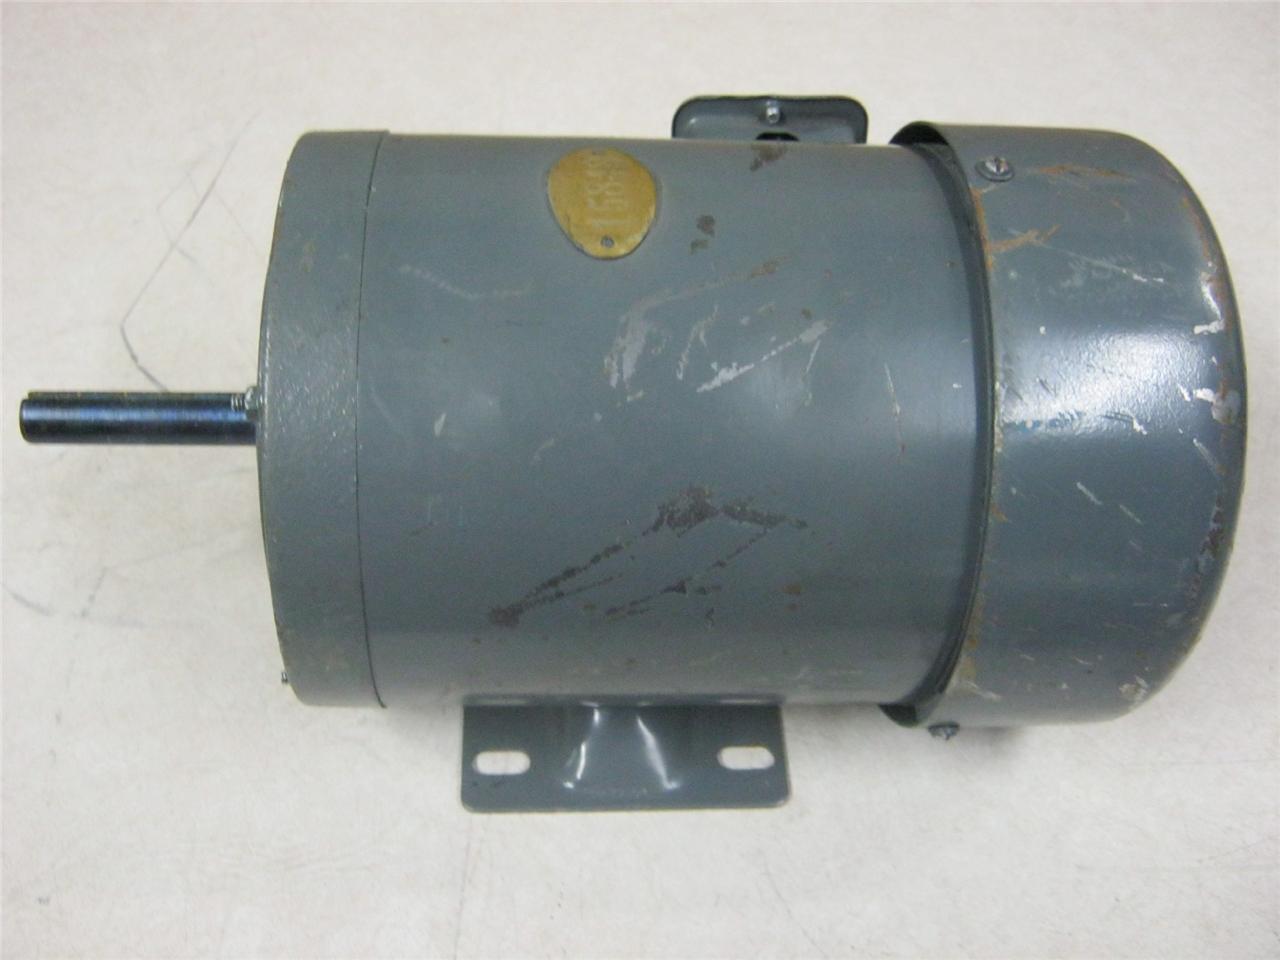 ge induction motor wiring diagram induction motor 1 hp 220/440 volt 60 hz 1720 rpm | ebay